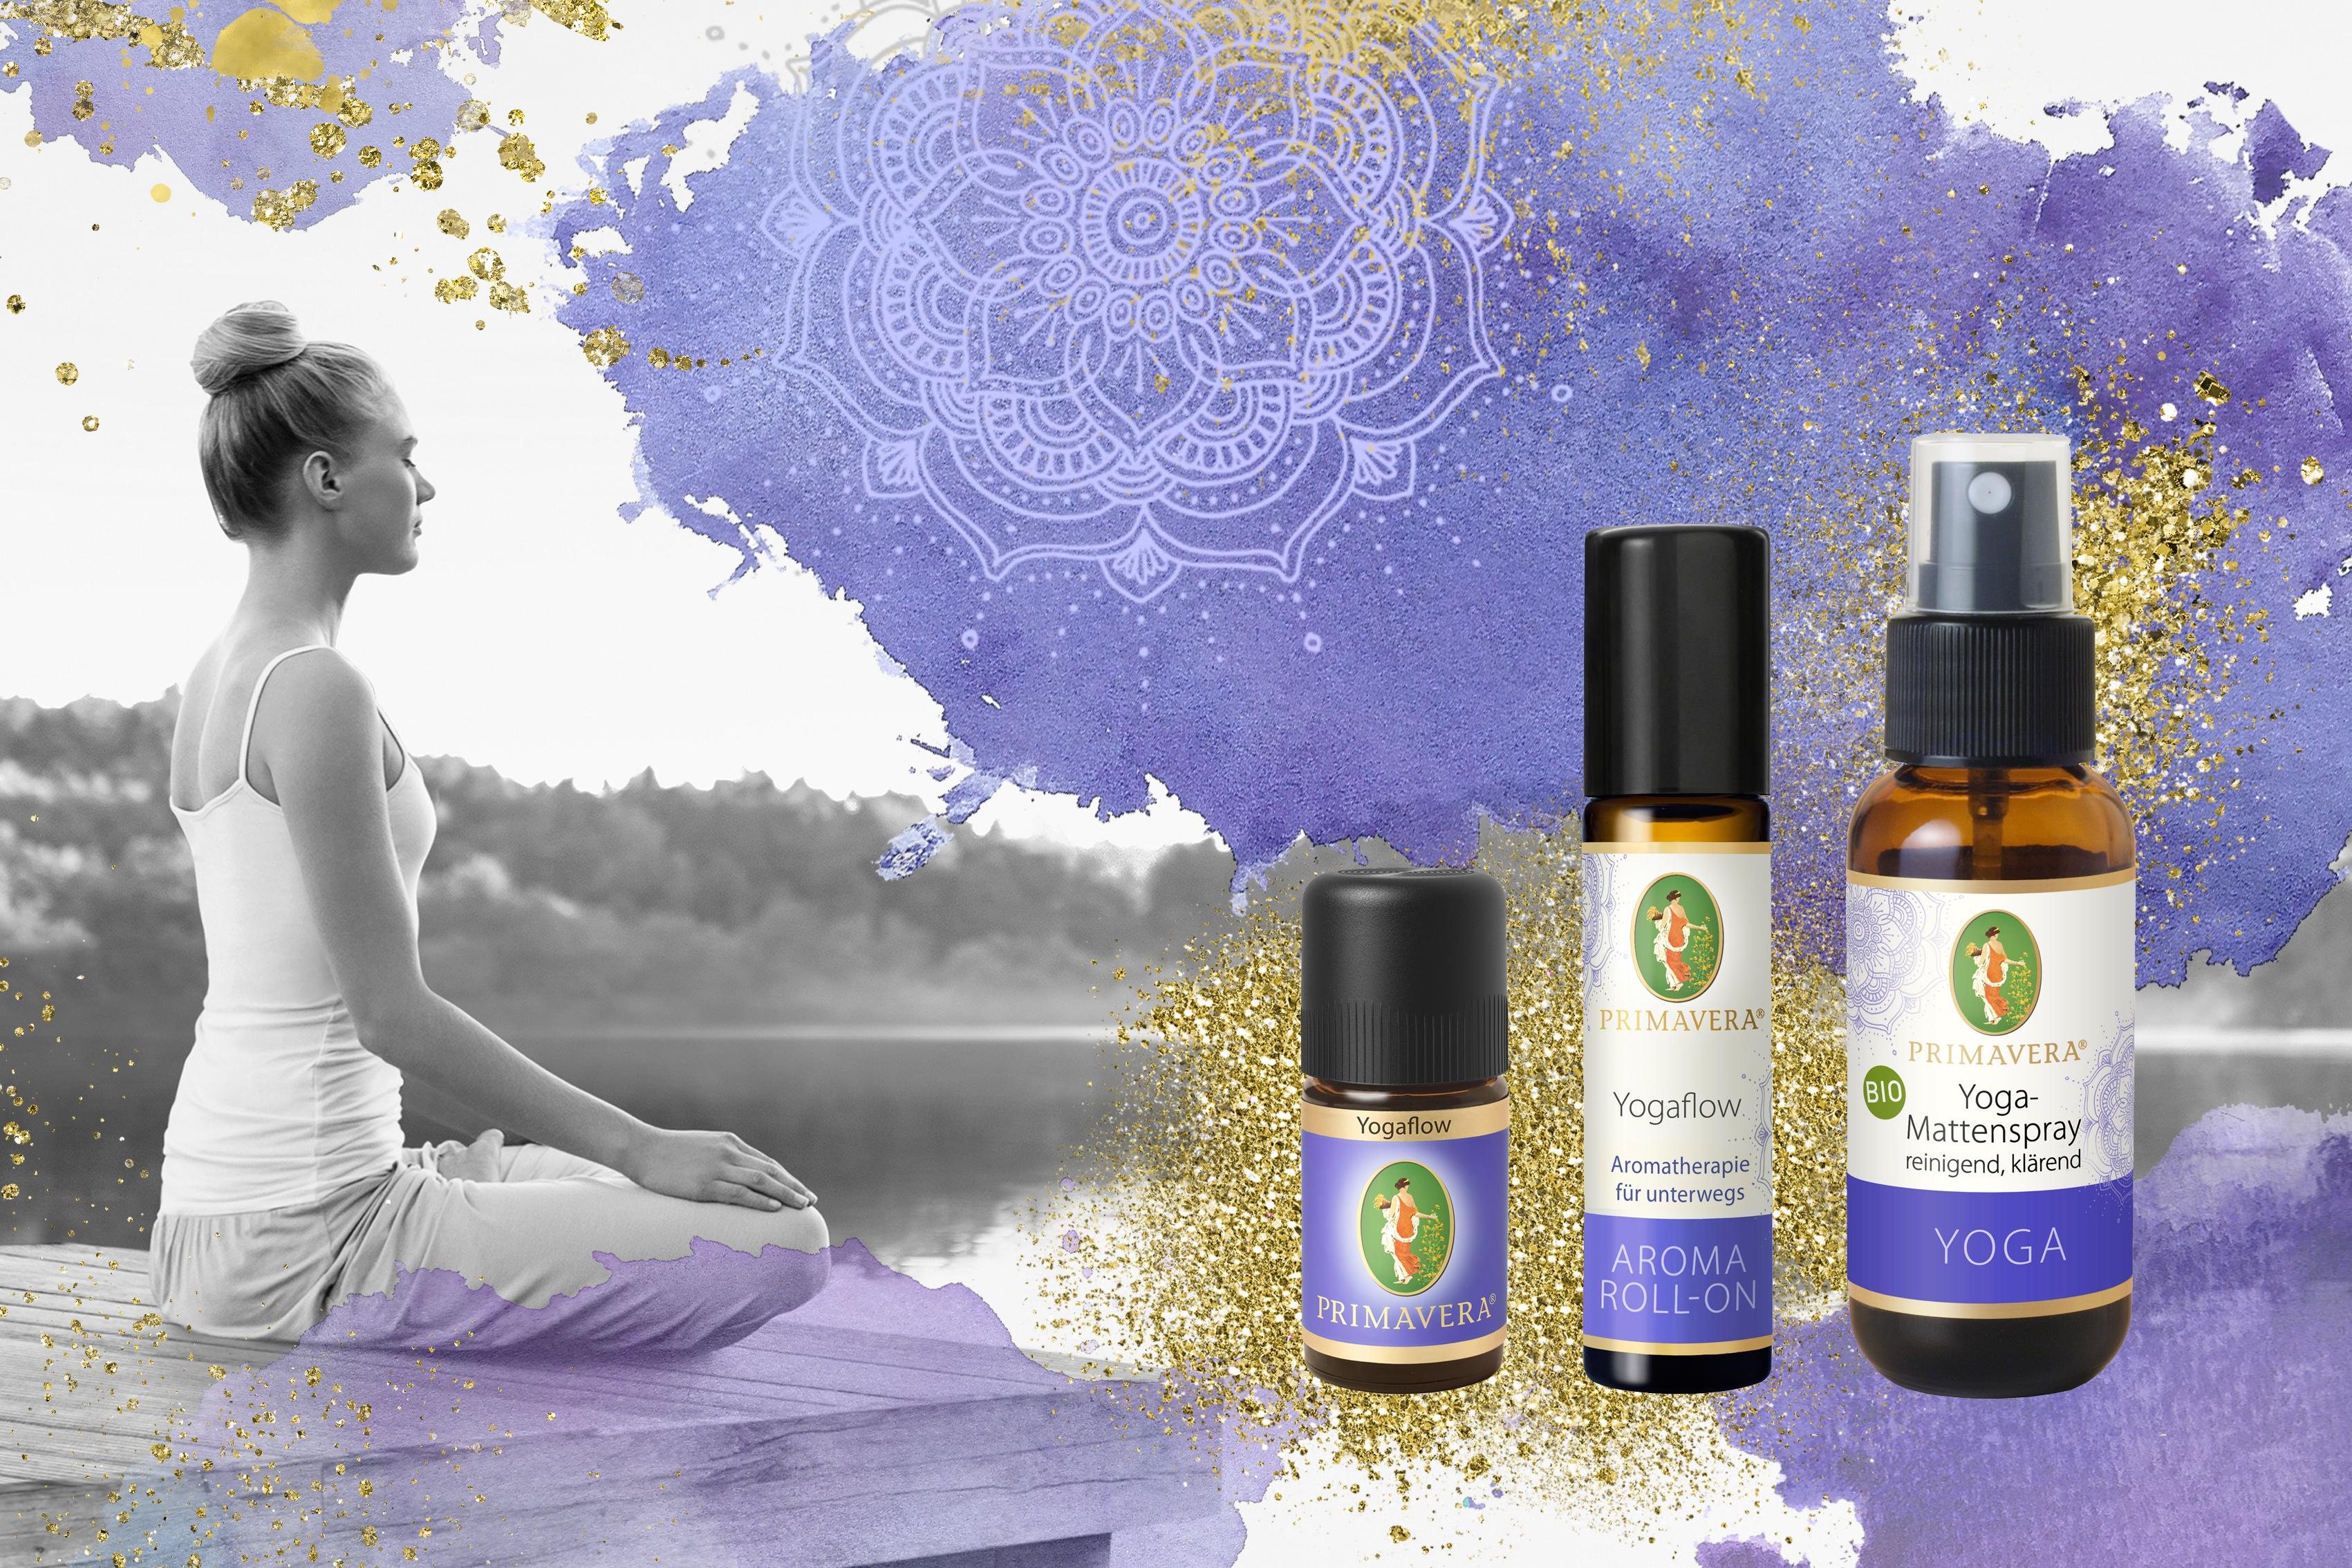 primavera-yoga-kollektion-yogaflow-yogamattenspray